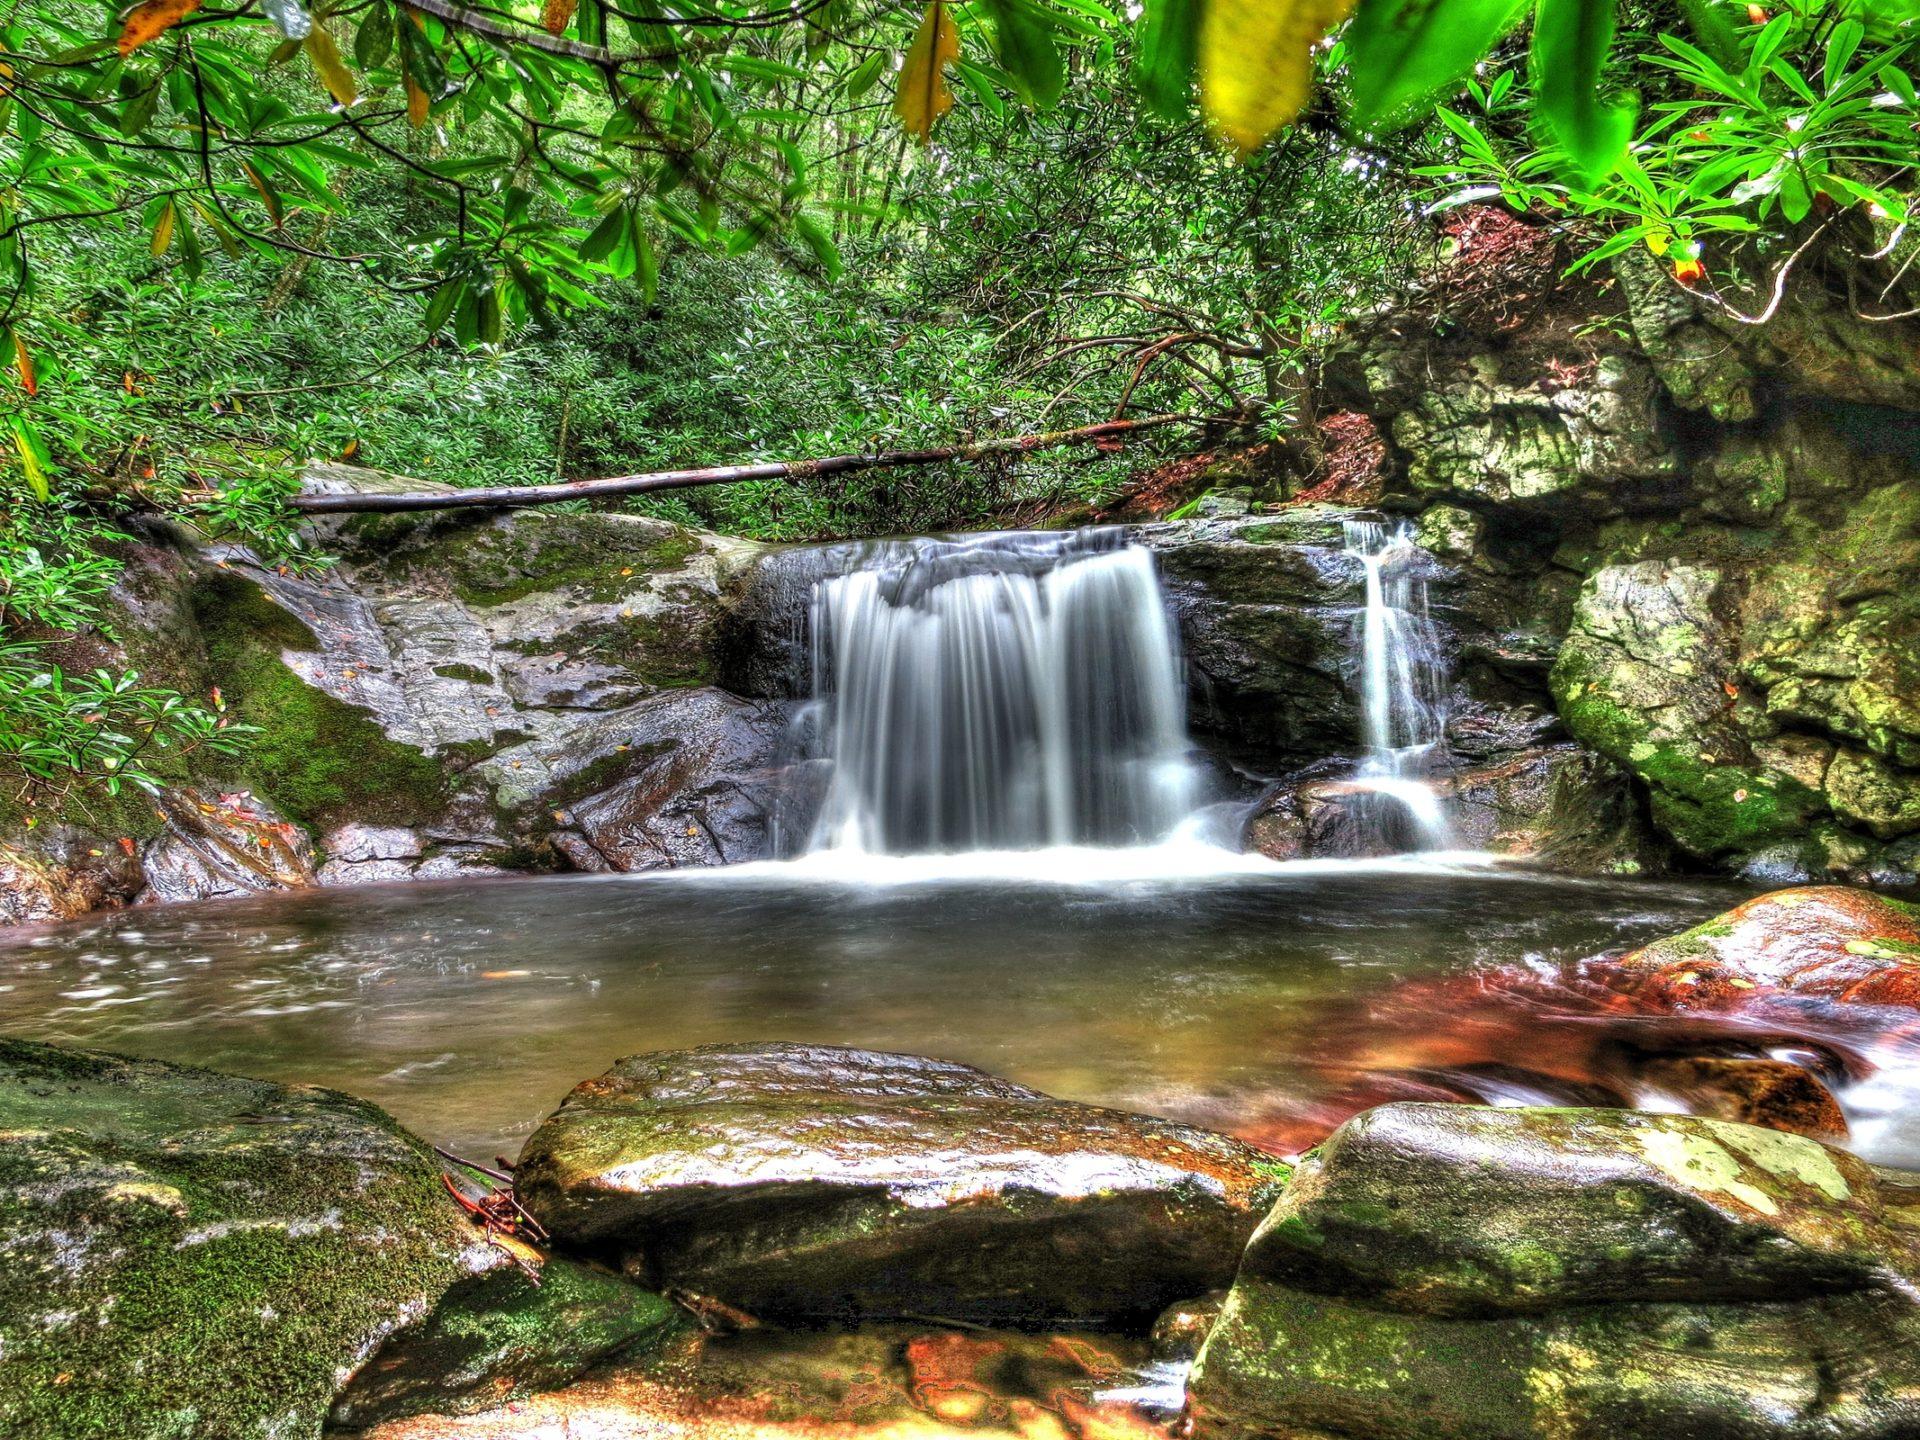 Iguazu Falls Wallpaper Forest Waterfall Desktop Background Hd Wallpapers 06739